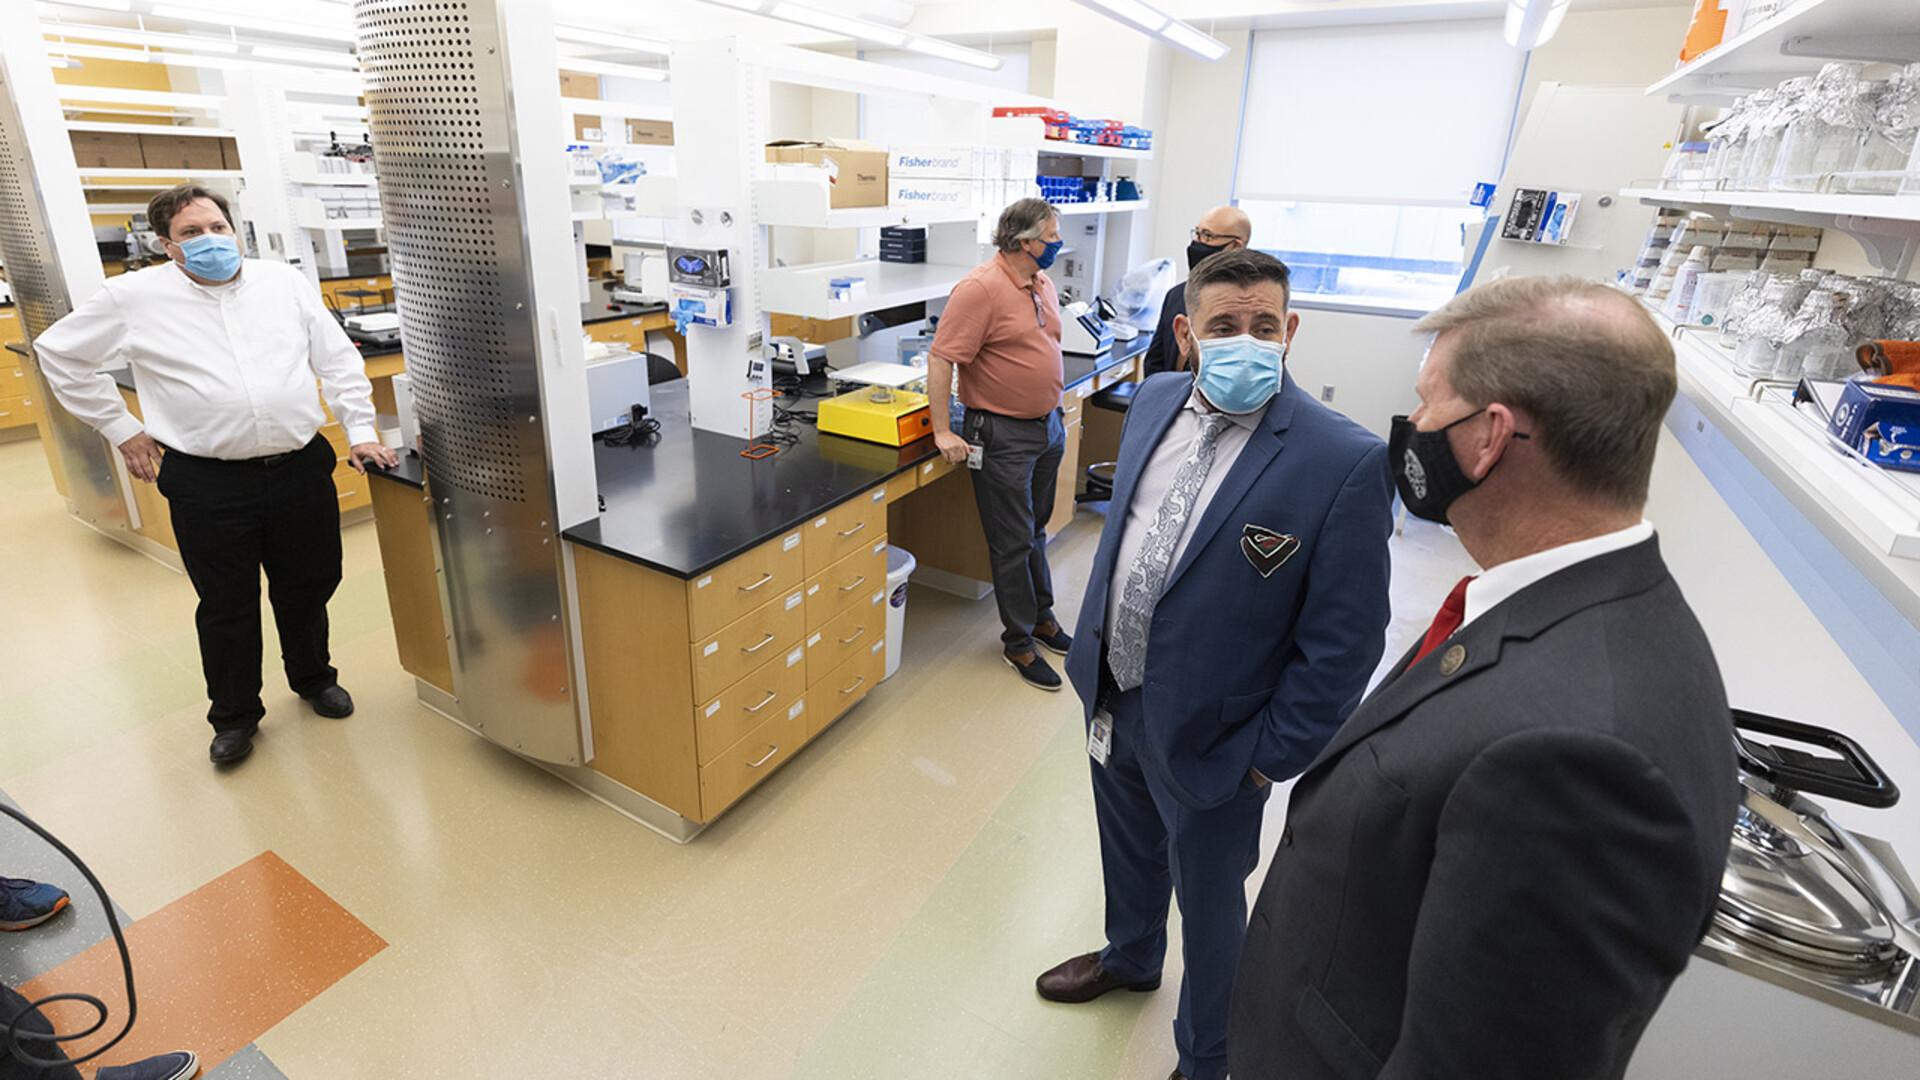 Collaborative Biosecurity Laboratory opens to pursue ag defense research